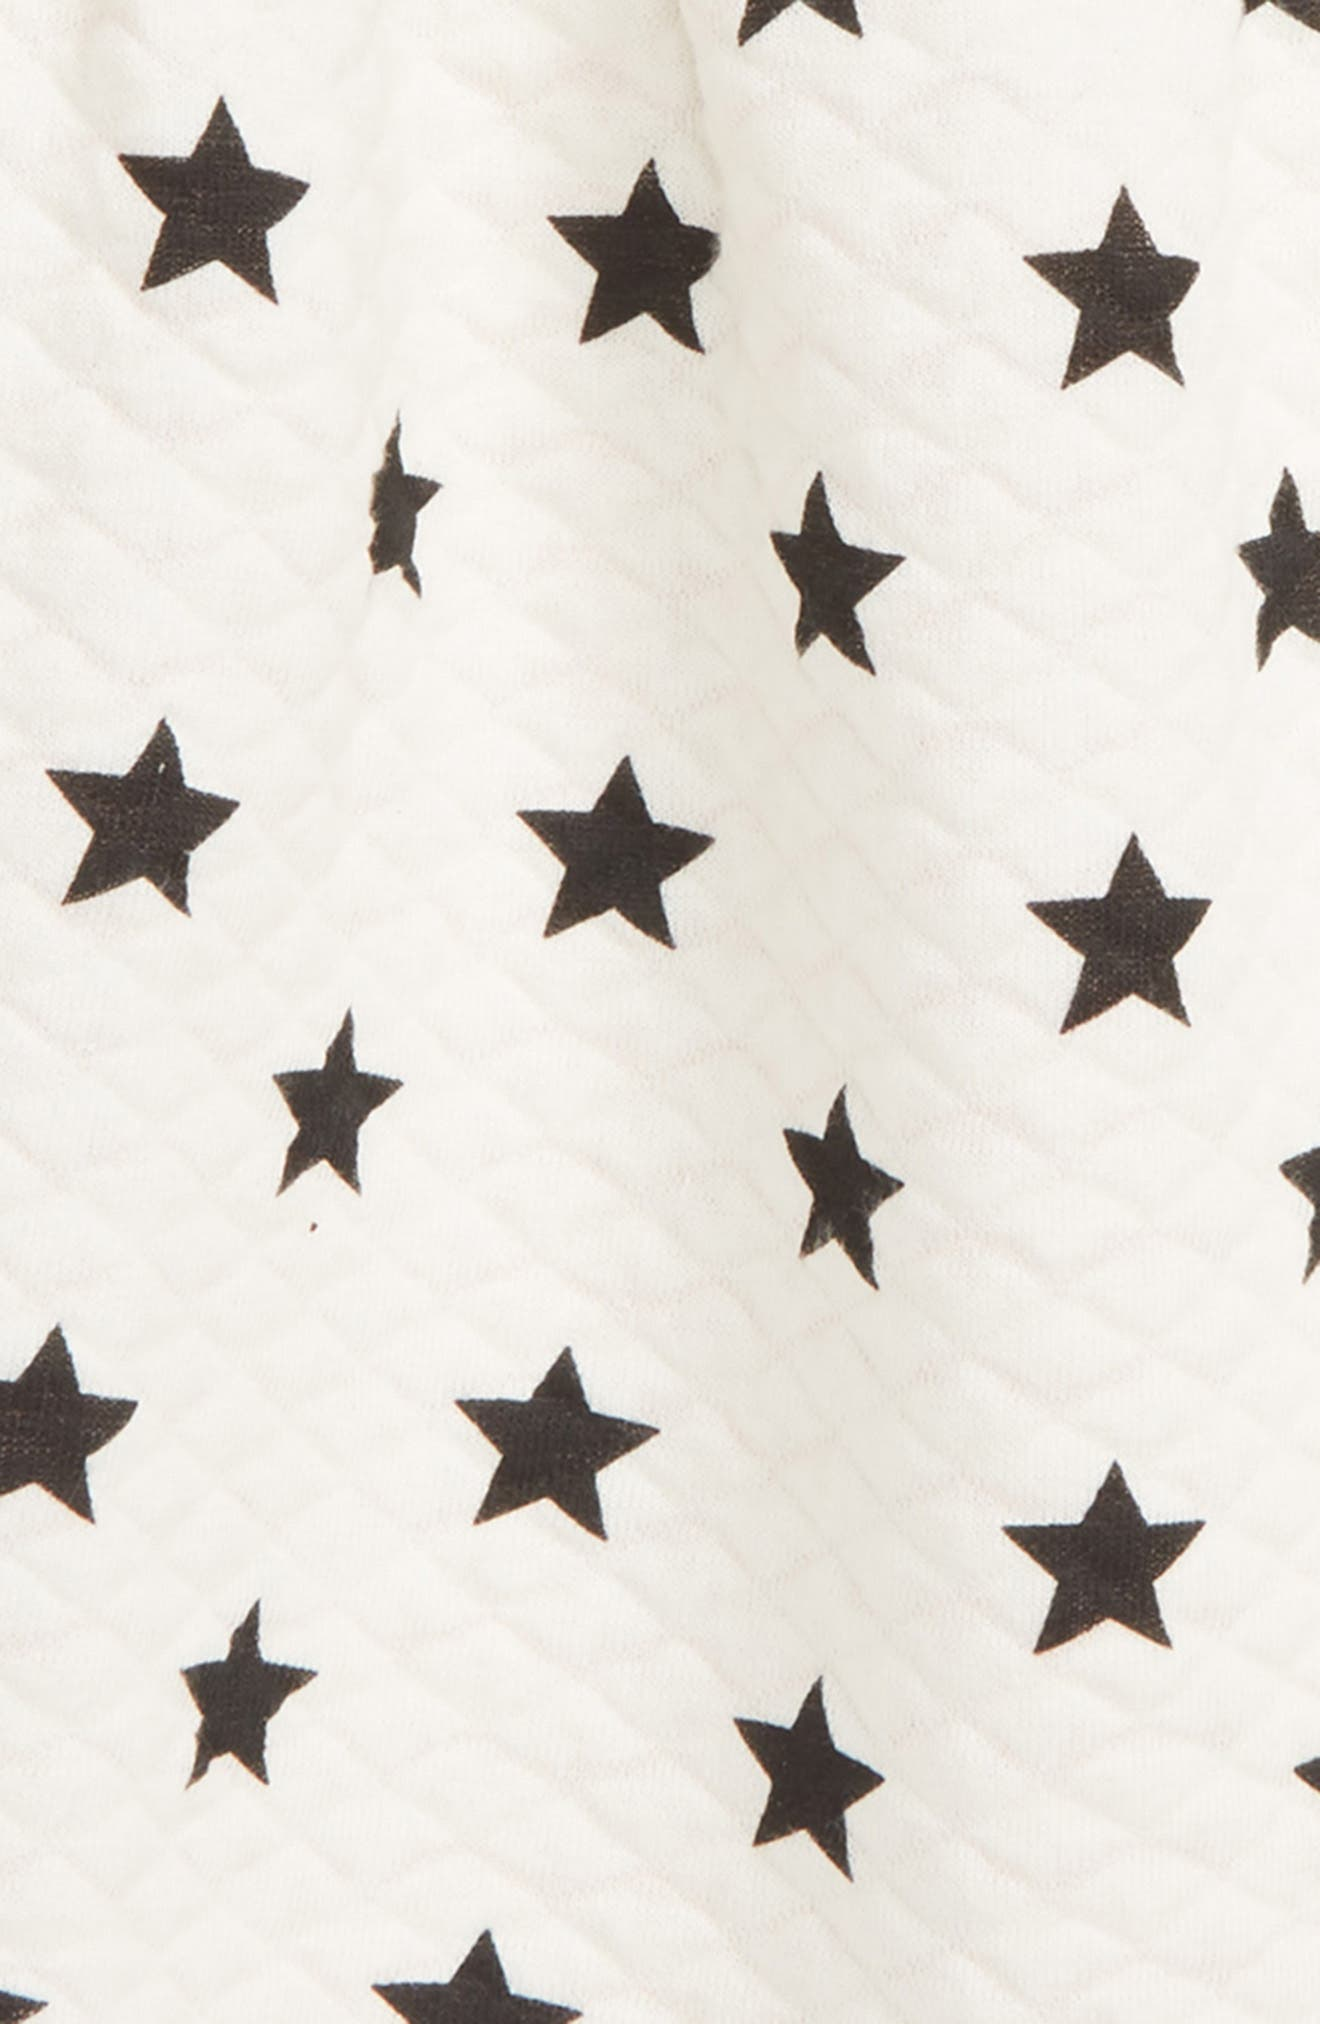 Star Quilted Dress,                             Alternate thumbnail 3, color,                             IVORY EGRET STARS